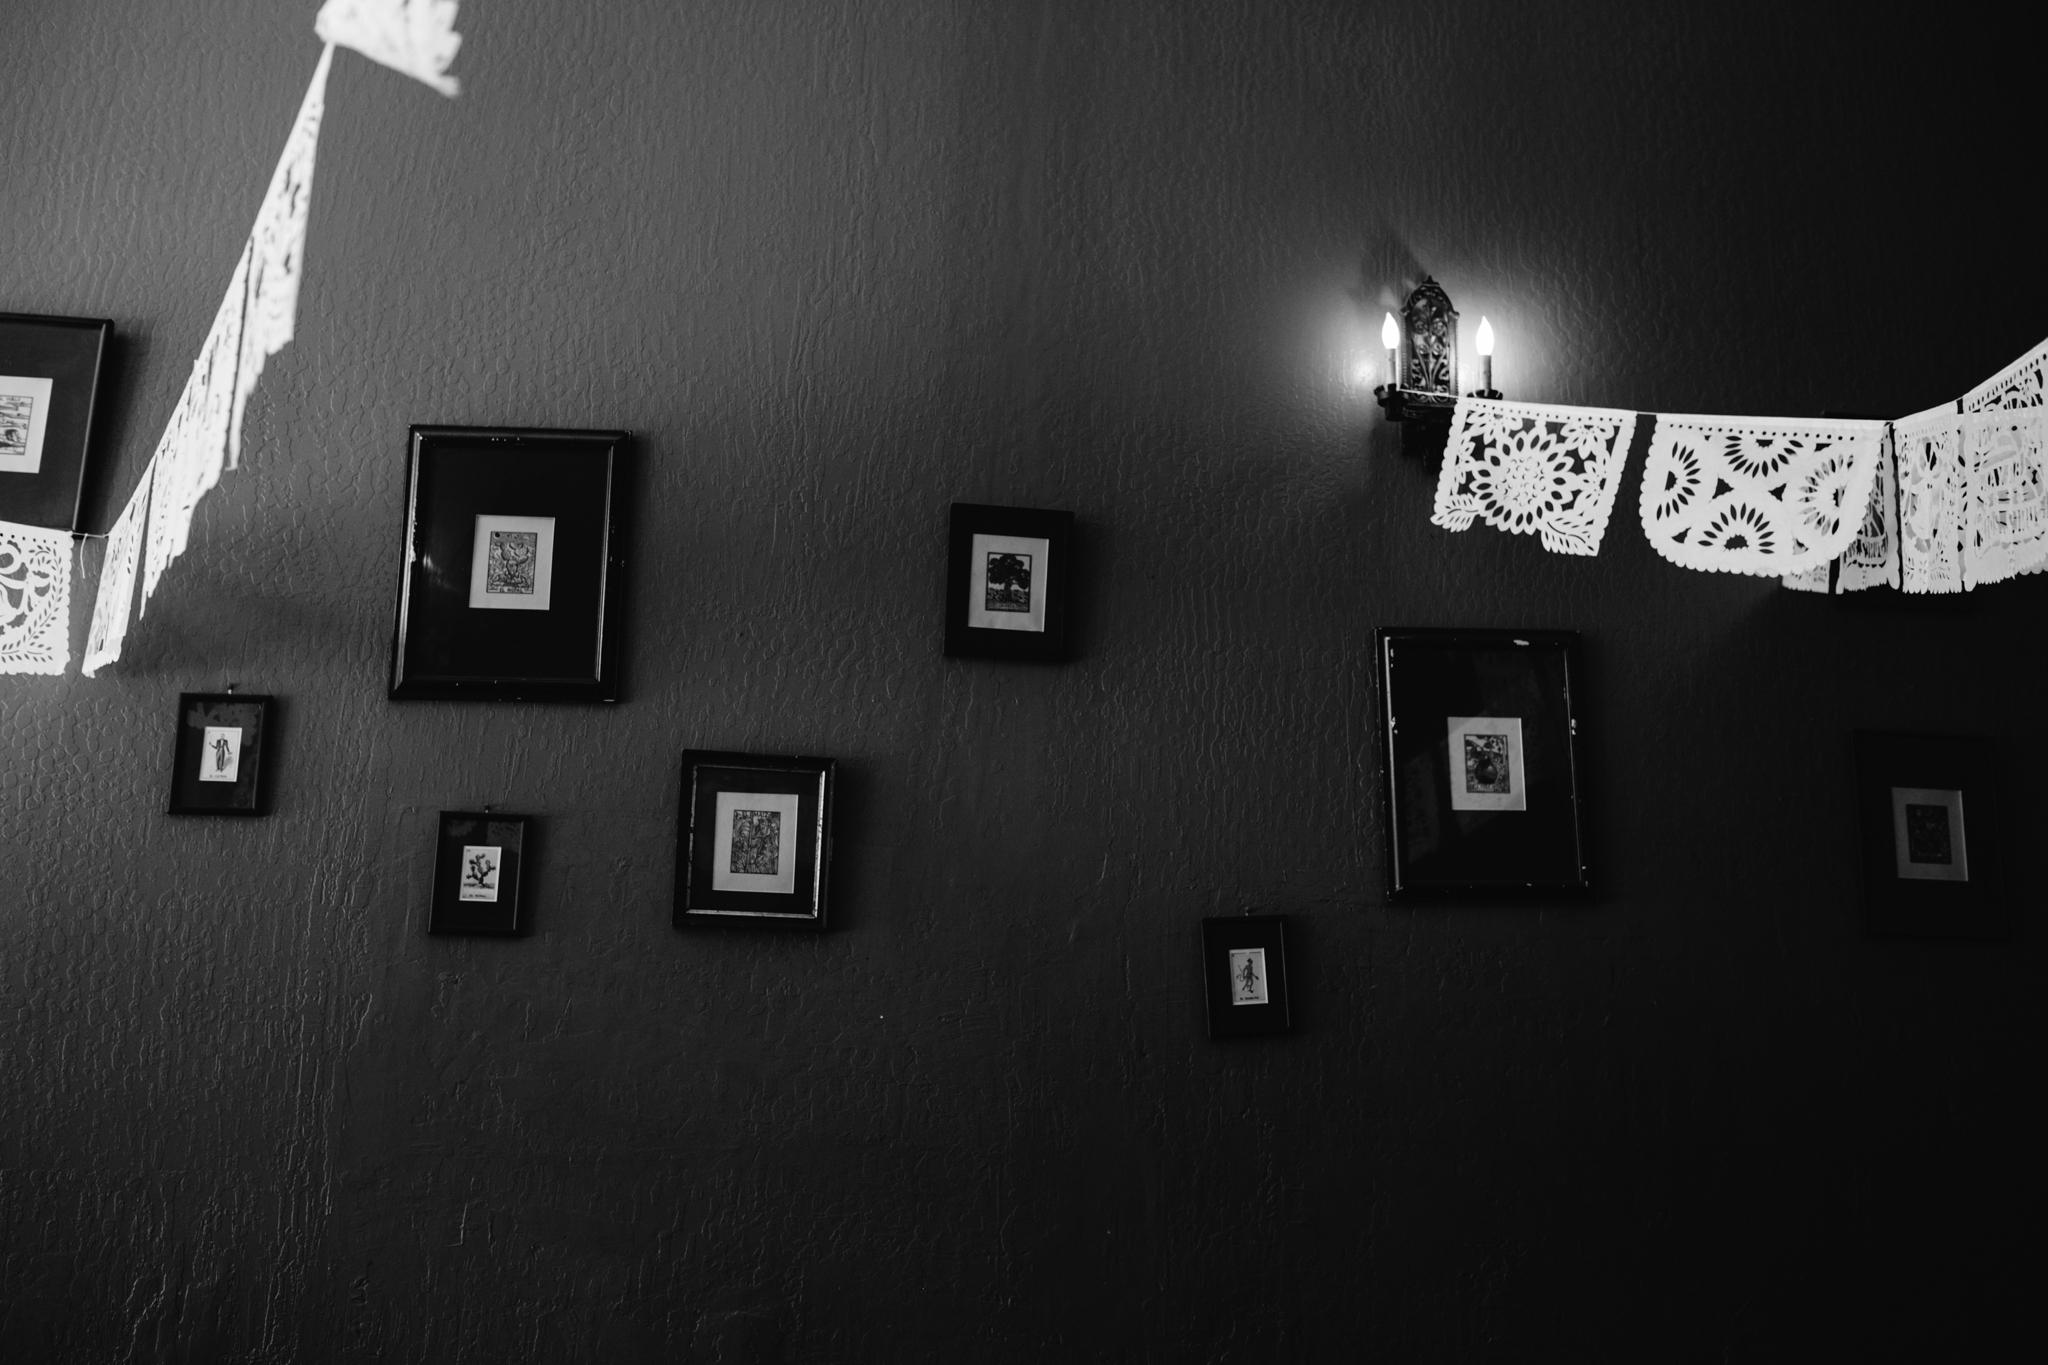 UC Berkeley Botanitcal Garden Wedding, Dona Tomas wedding, Crimson hort wedding bouquet, crimson hart Oakland, UC Berkeley wedding photos, Oakland wedding venue, okalnad wedding photographer, East bay wedding photographer, Plant wall for wedding, Palm Springs wedding photographer, San Francisco wedding photographer, Bay Area wedding photographer, california wedding photographer, Northern California wedding, Los Angeles wedding photographer, California elopement, Intimate wedding in california, Bay Area wedding, sf Bay Area wedding videographer, wedding videographer in Bay Area, wedding videographer in california, tattooed bride